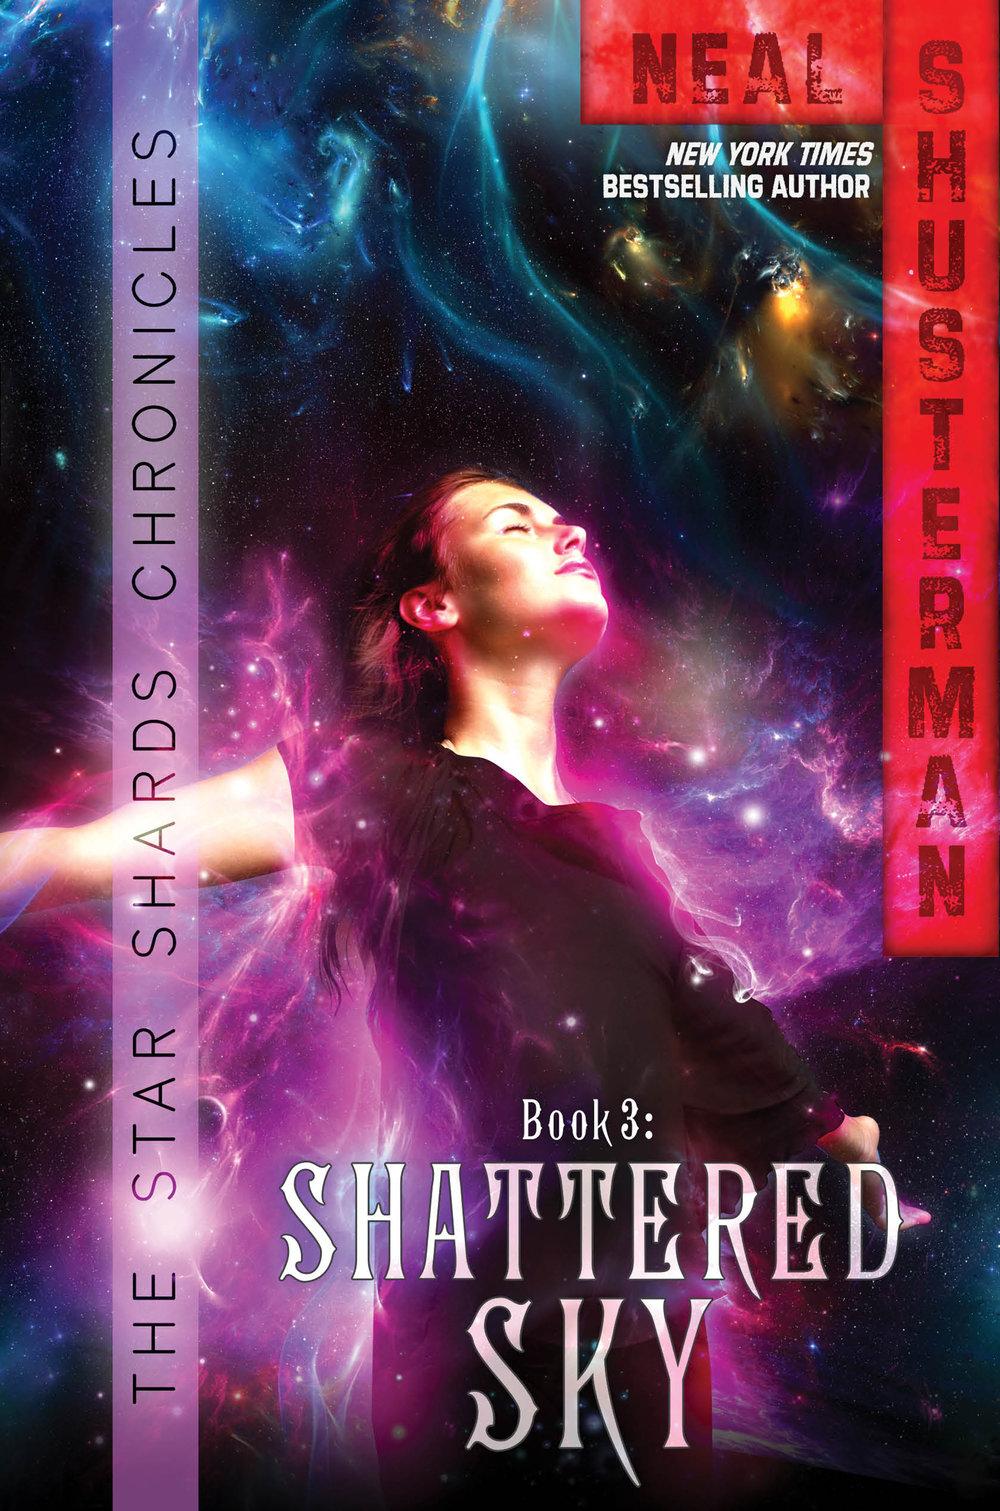 Book 3: Shattered Sky